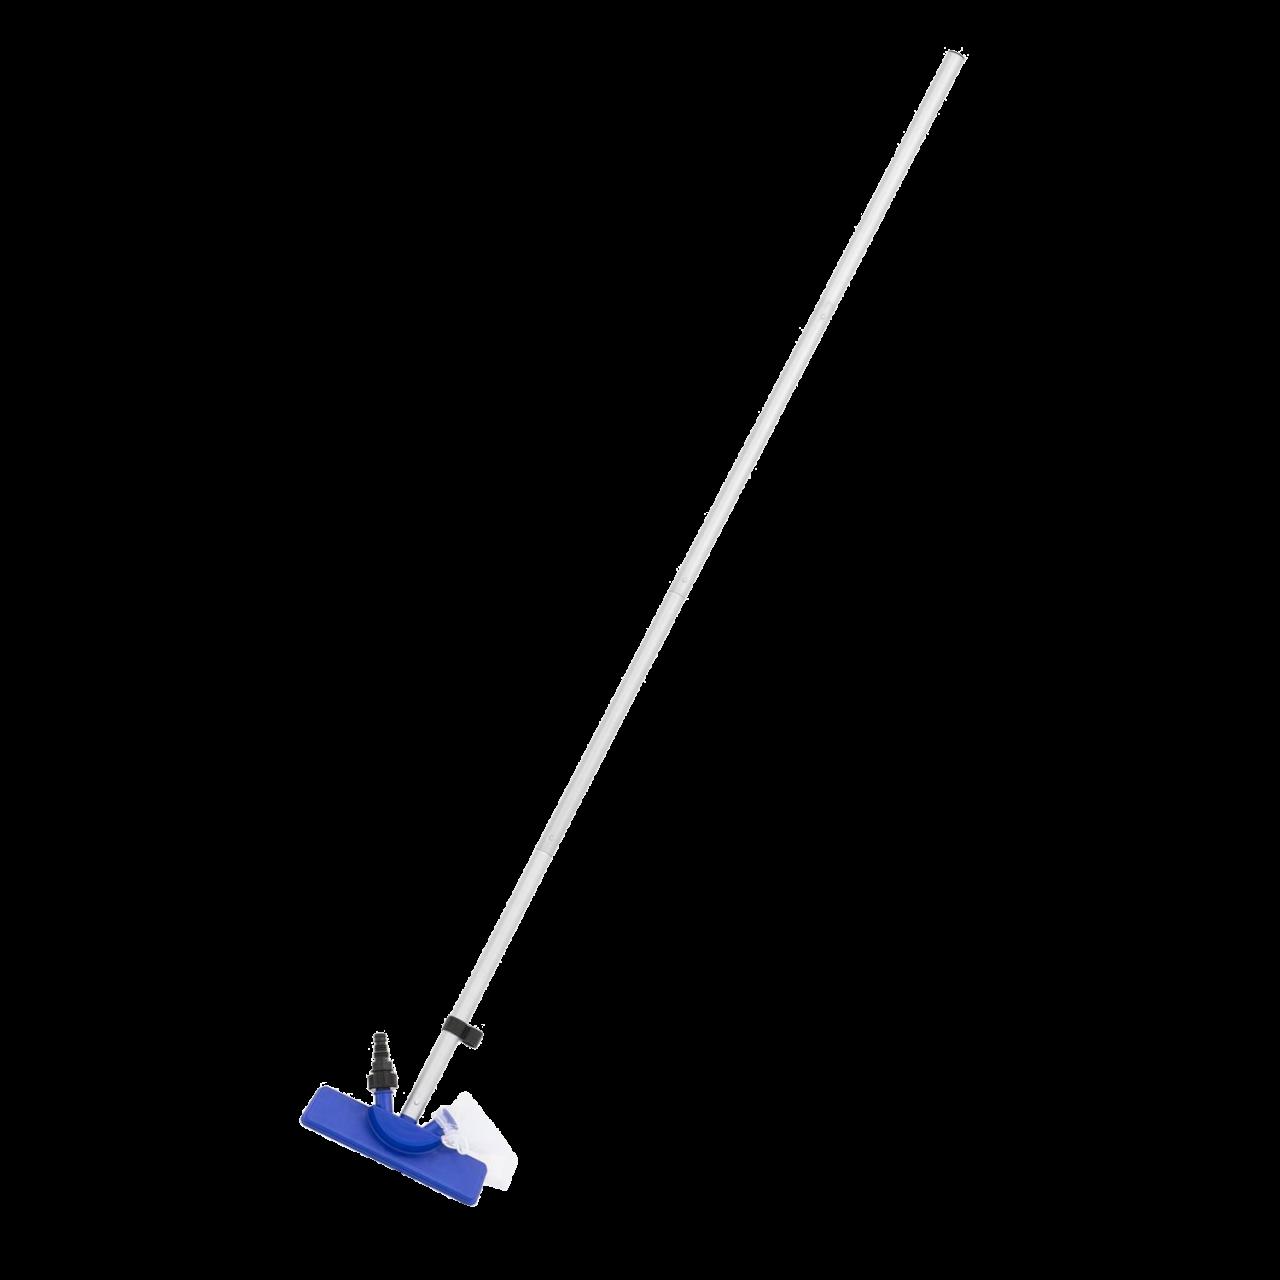 Bestway Flowclear Poolpflege Komplett-Set Poolreiniger Poolpflege Zubehör 58195